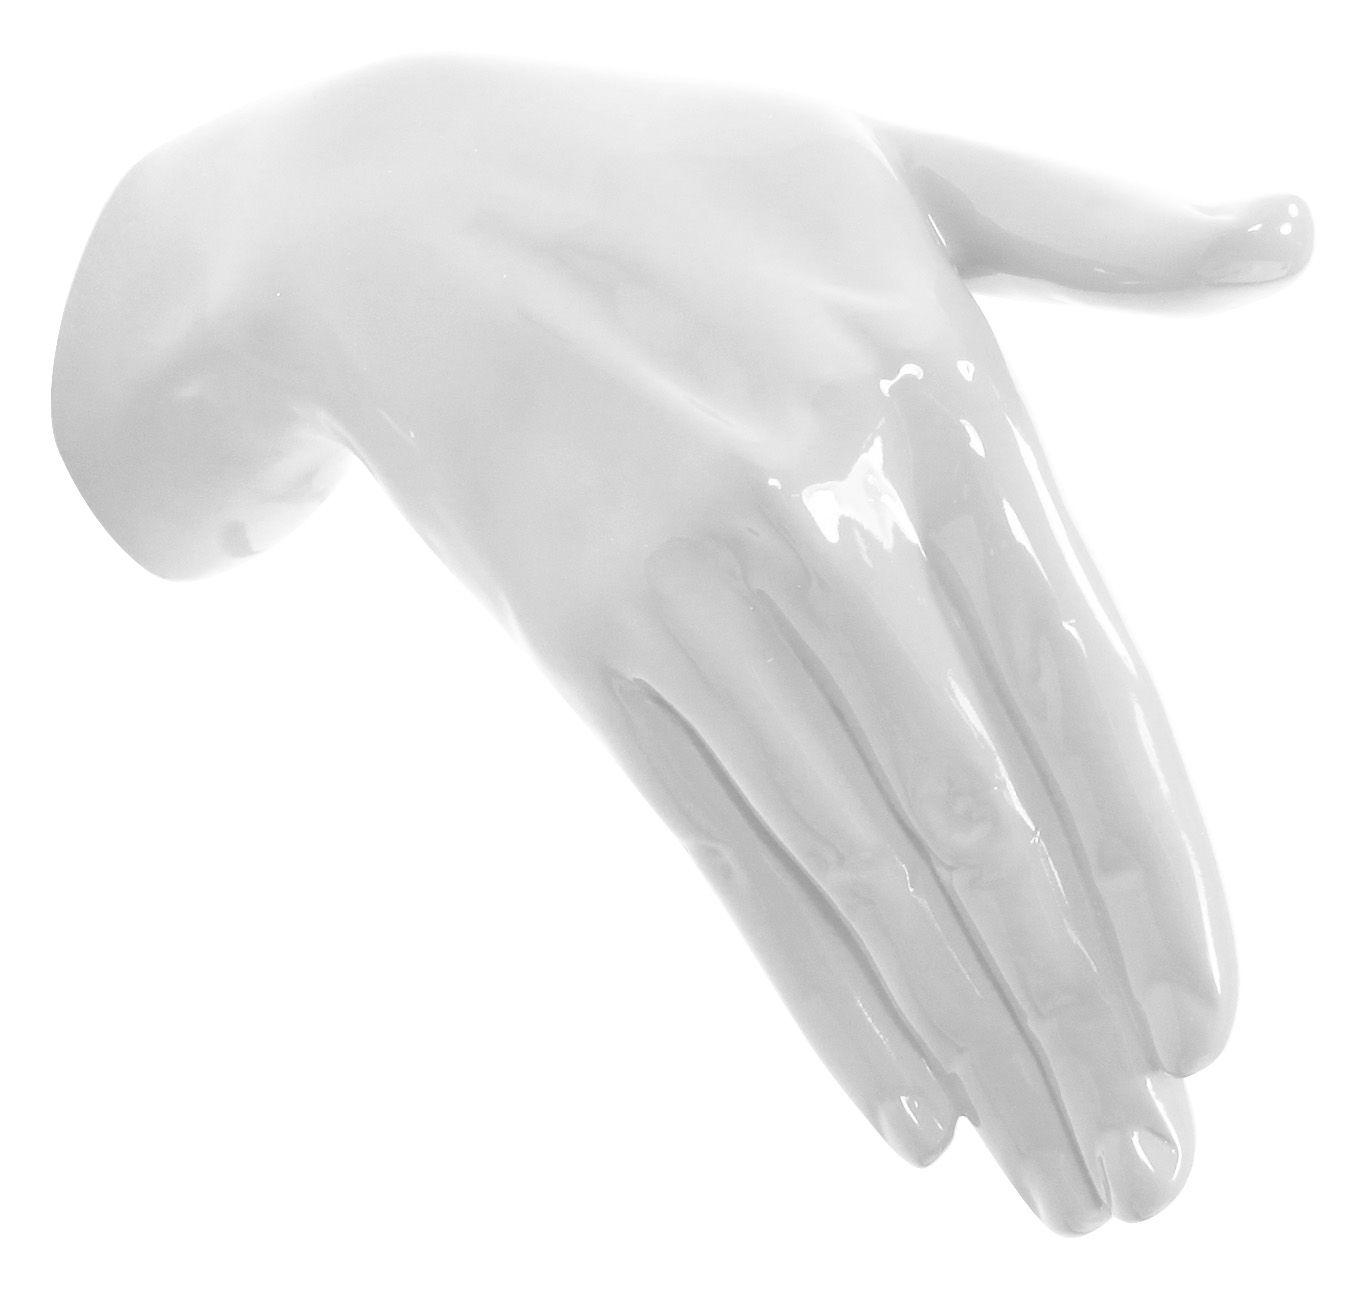 Furniture - Coat Racks & Pegs - Hand Job - Shake Hook - Shake by Thelermont Hupton - White - Laquered resin